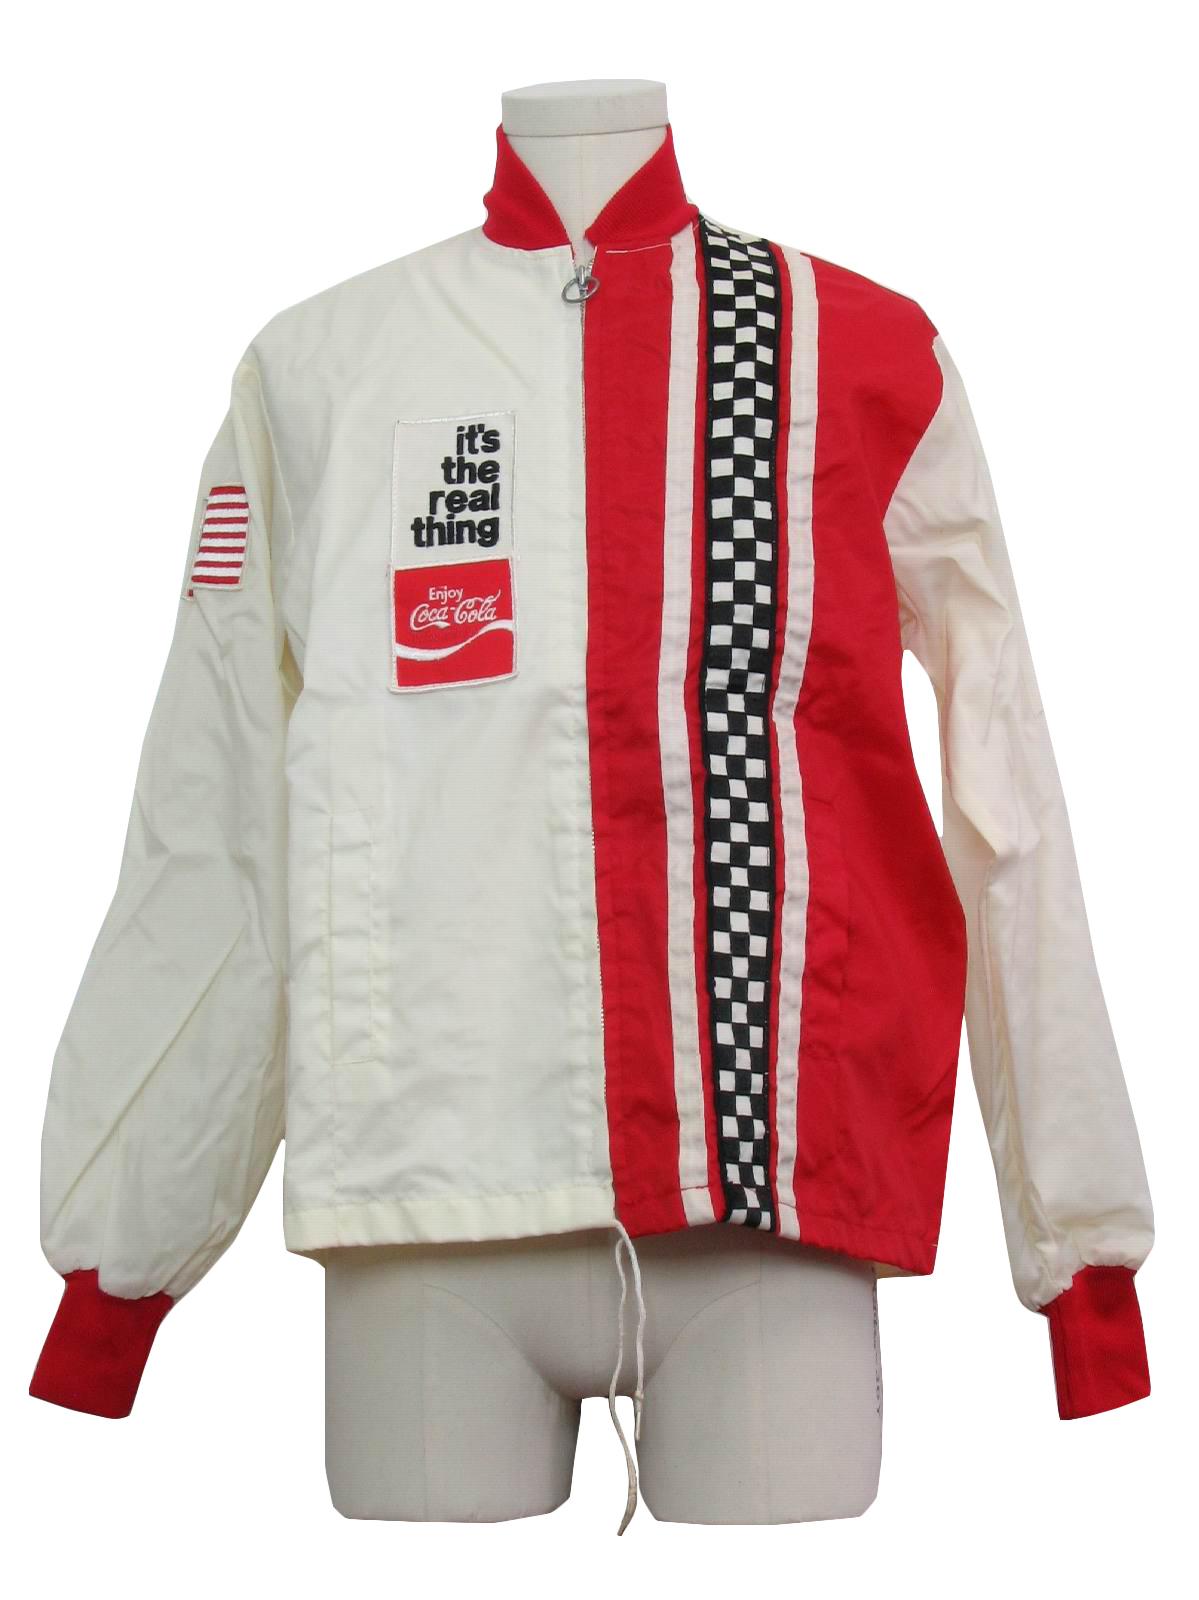 1970 COCA COLA COMPANY Vintage Jacket ergtSKI4E0